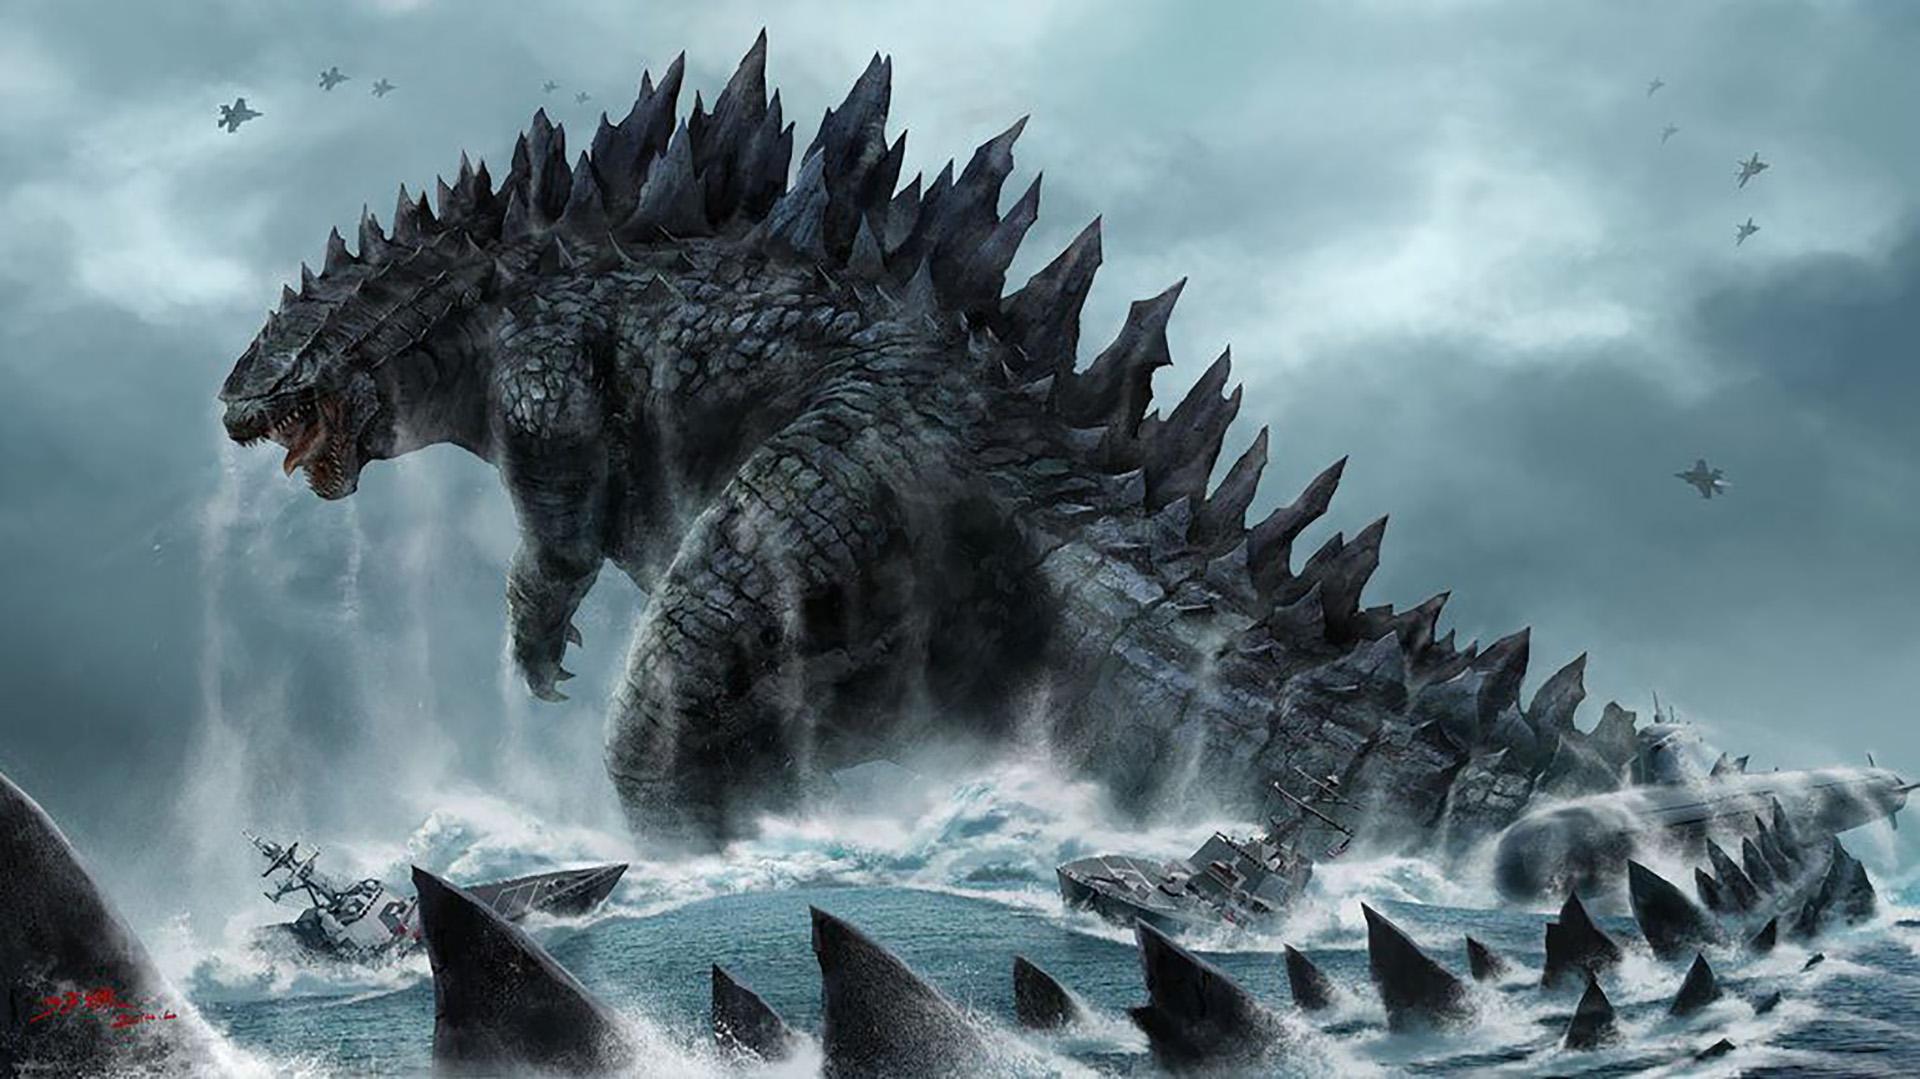 Godzilla 2El De Los Rey Vistazo Monstruos A Un Infobae CBtxshdoQr